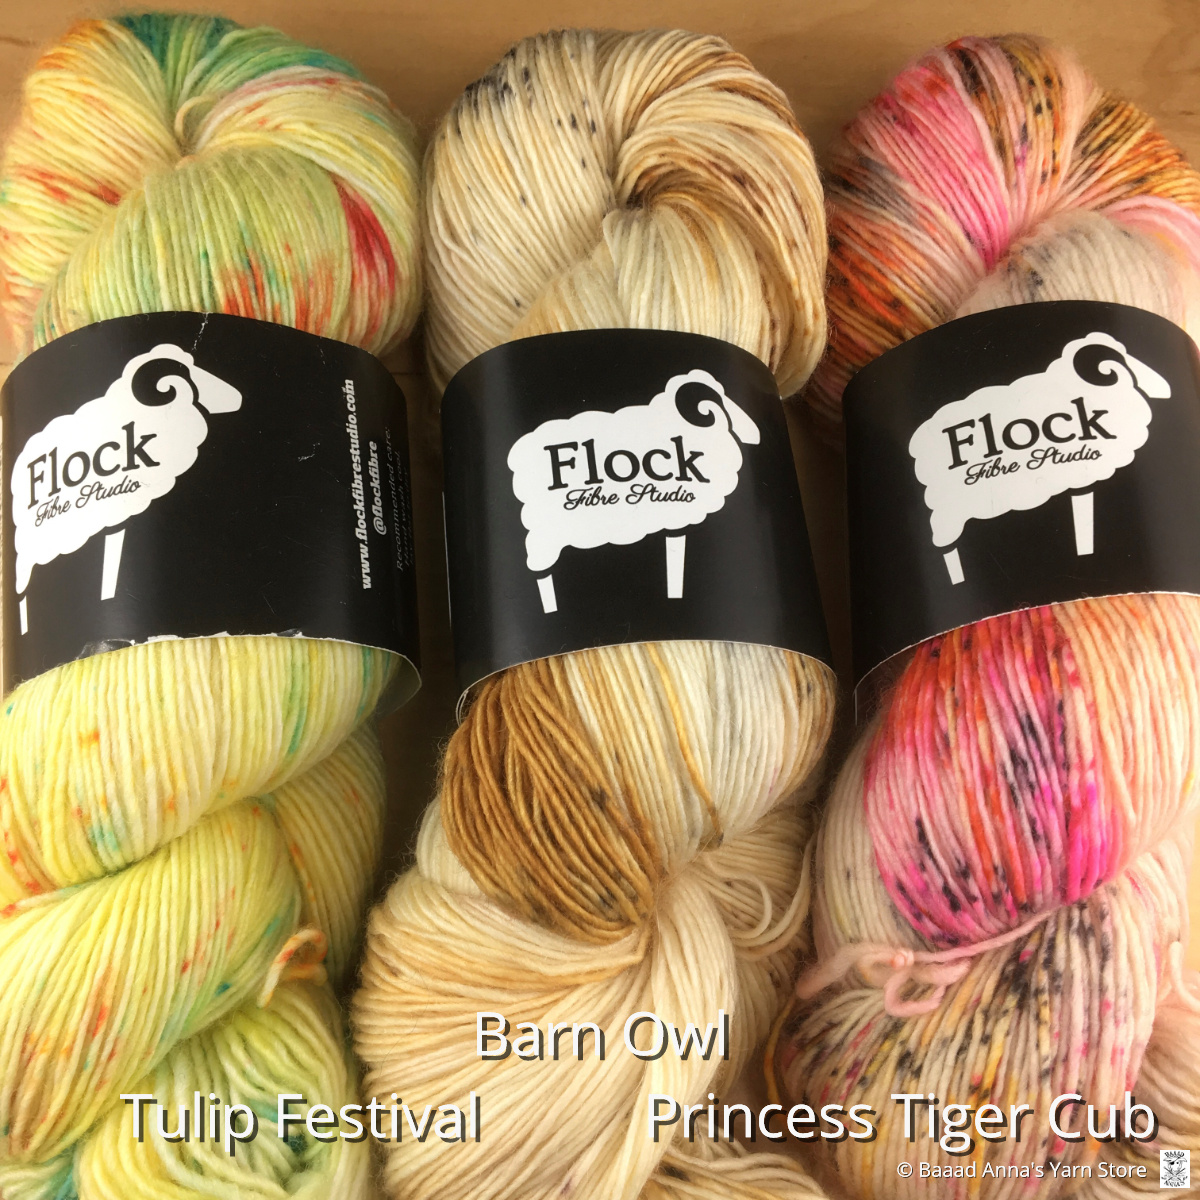 Flock Fibre Studio Flock Lone Pine Singles